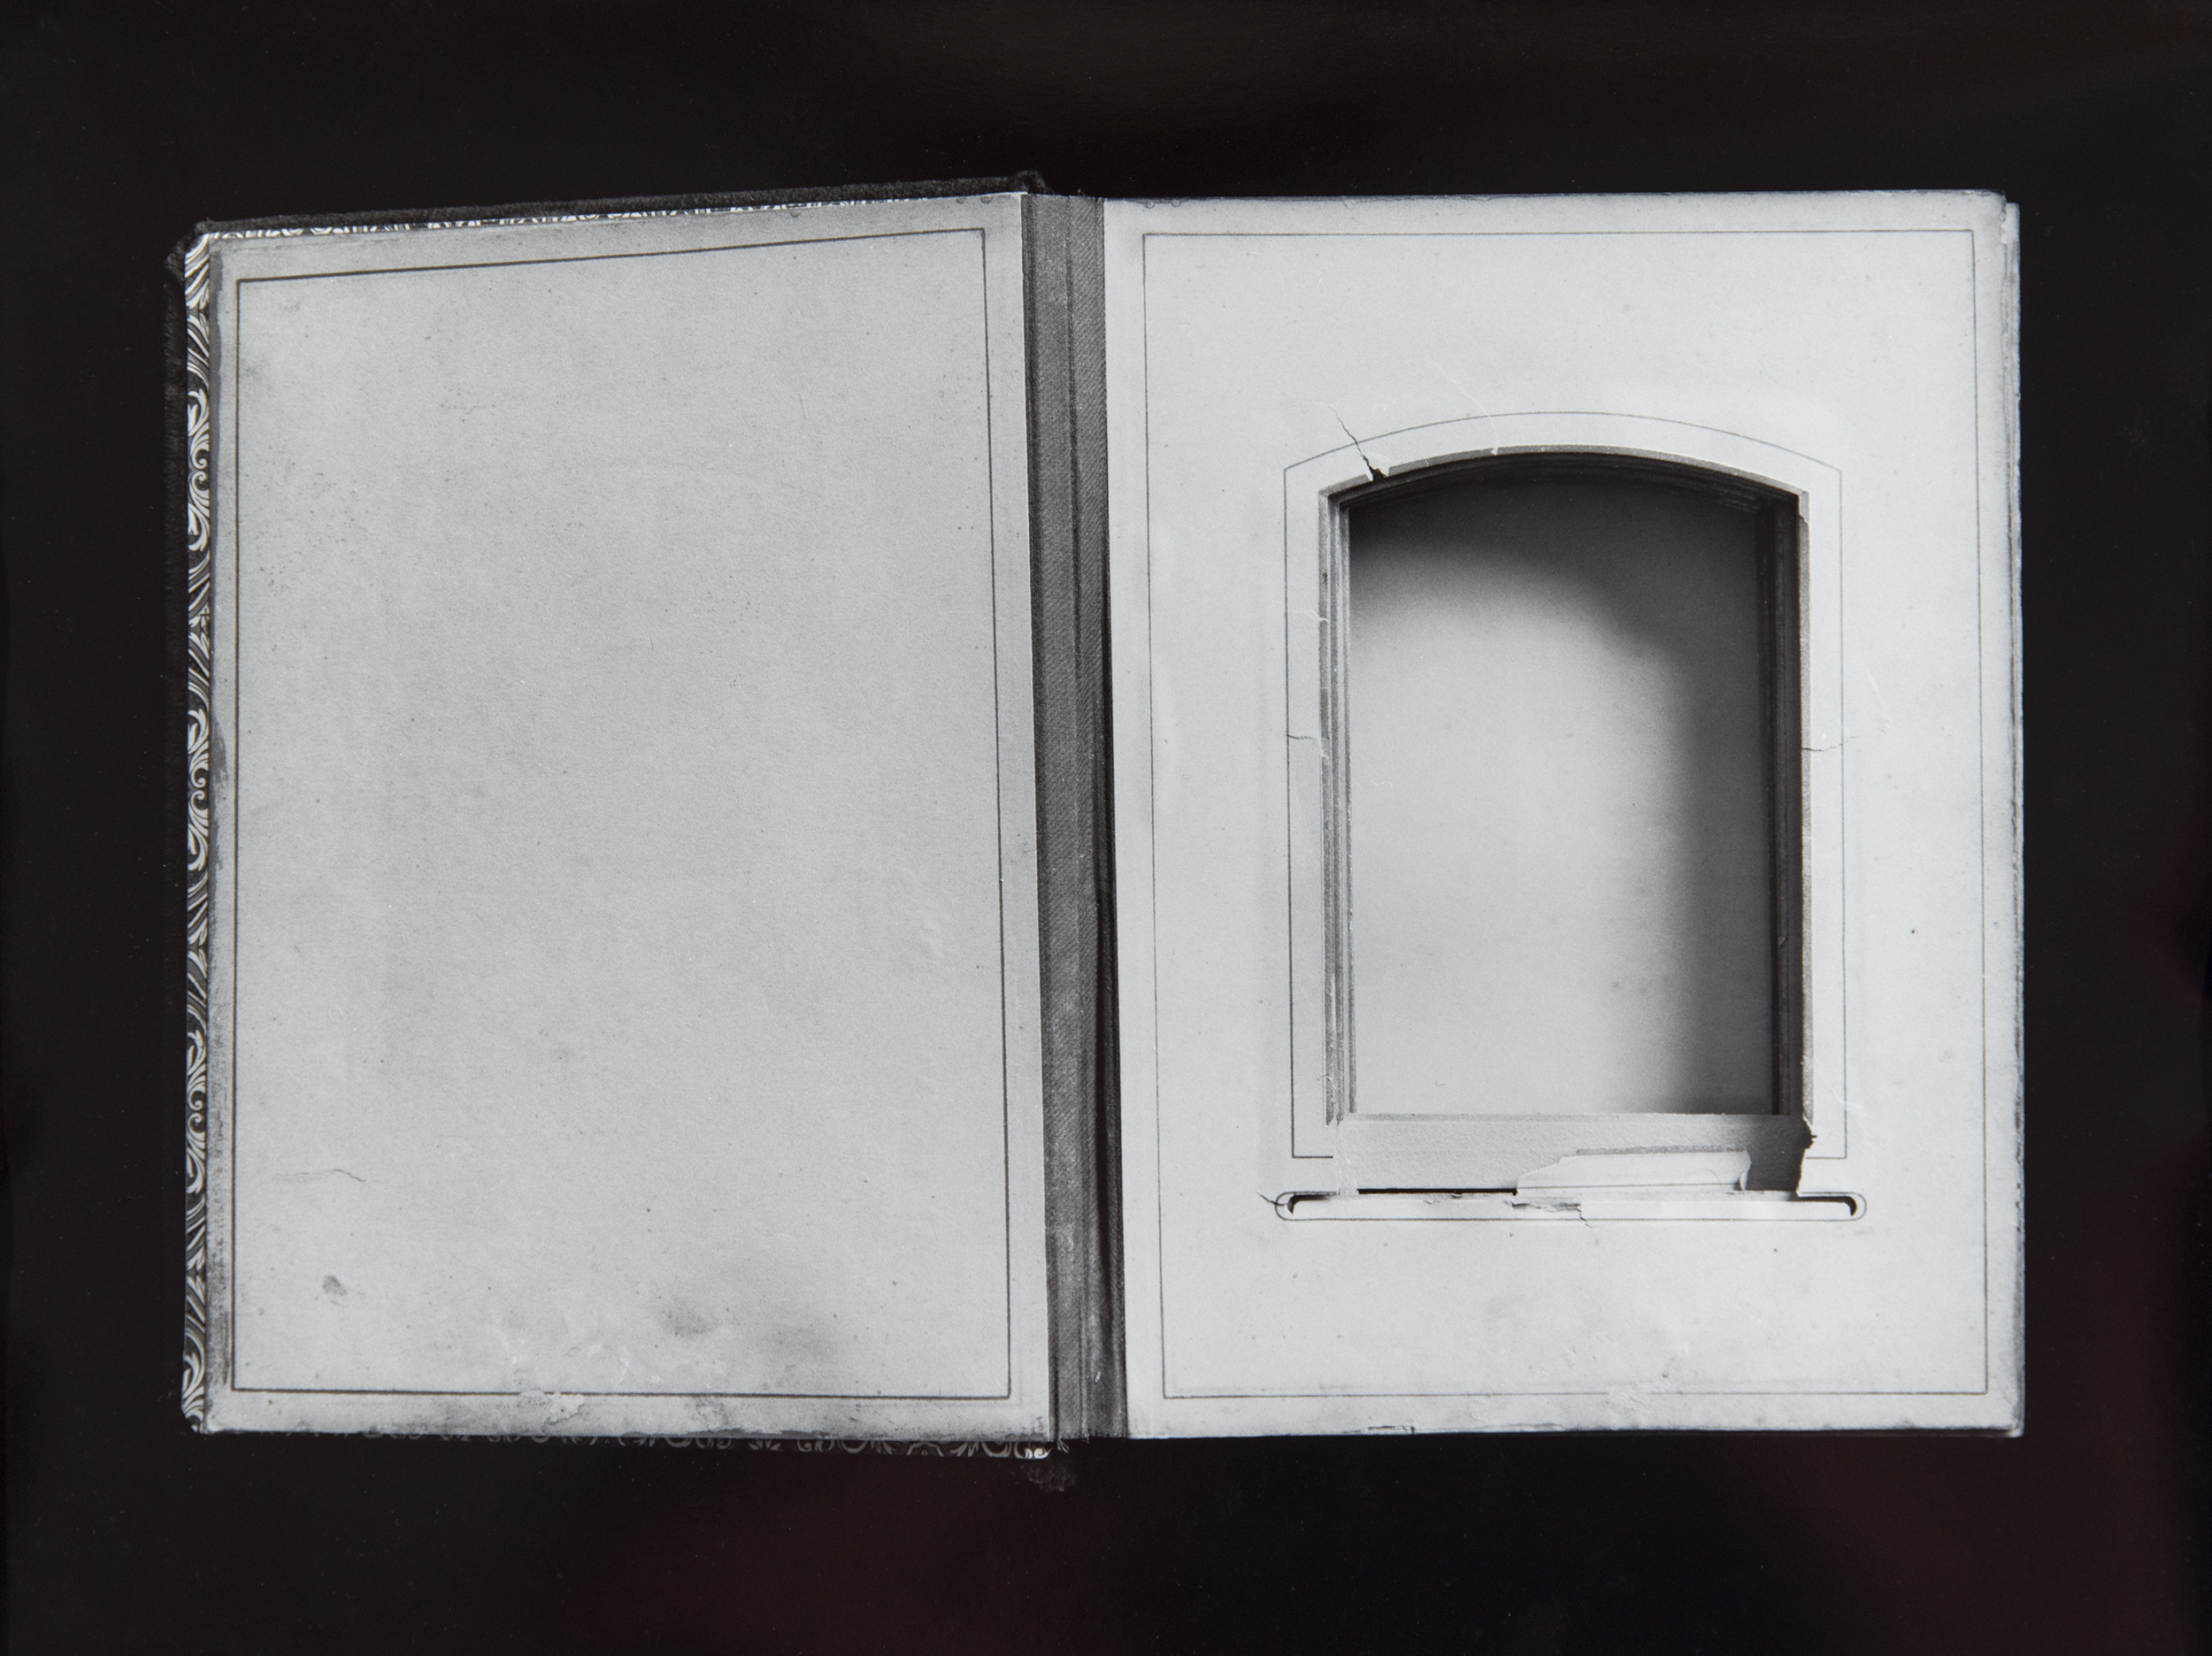 10-EmptyAlbum.jpg